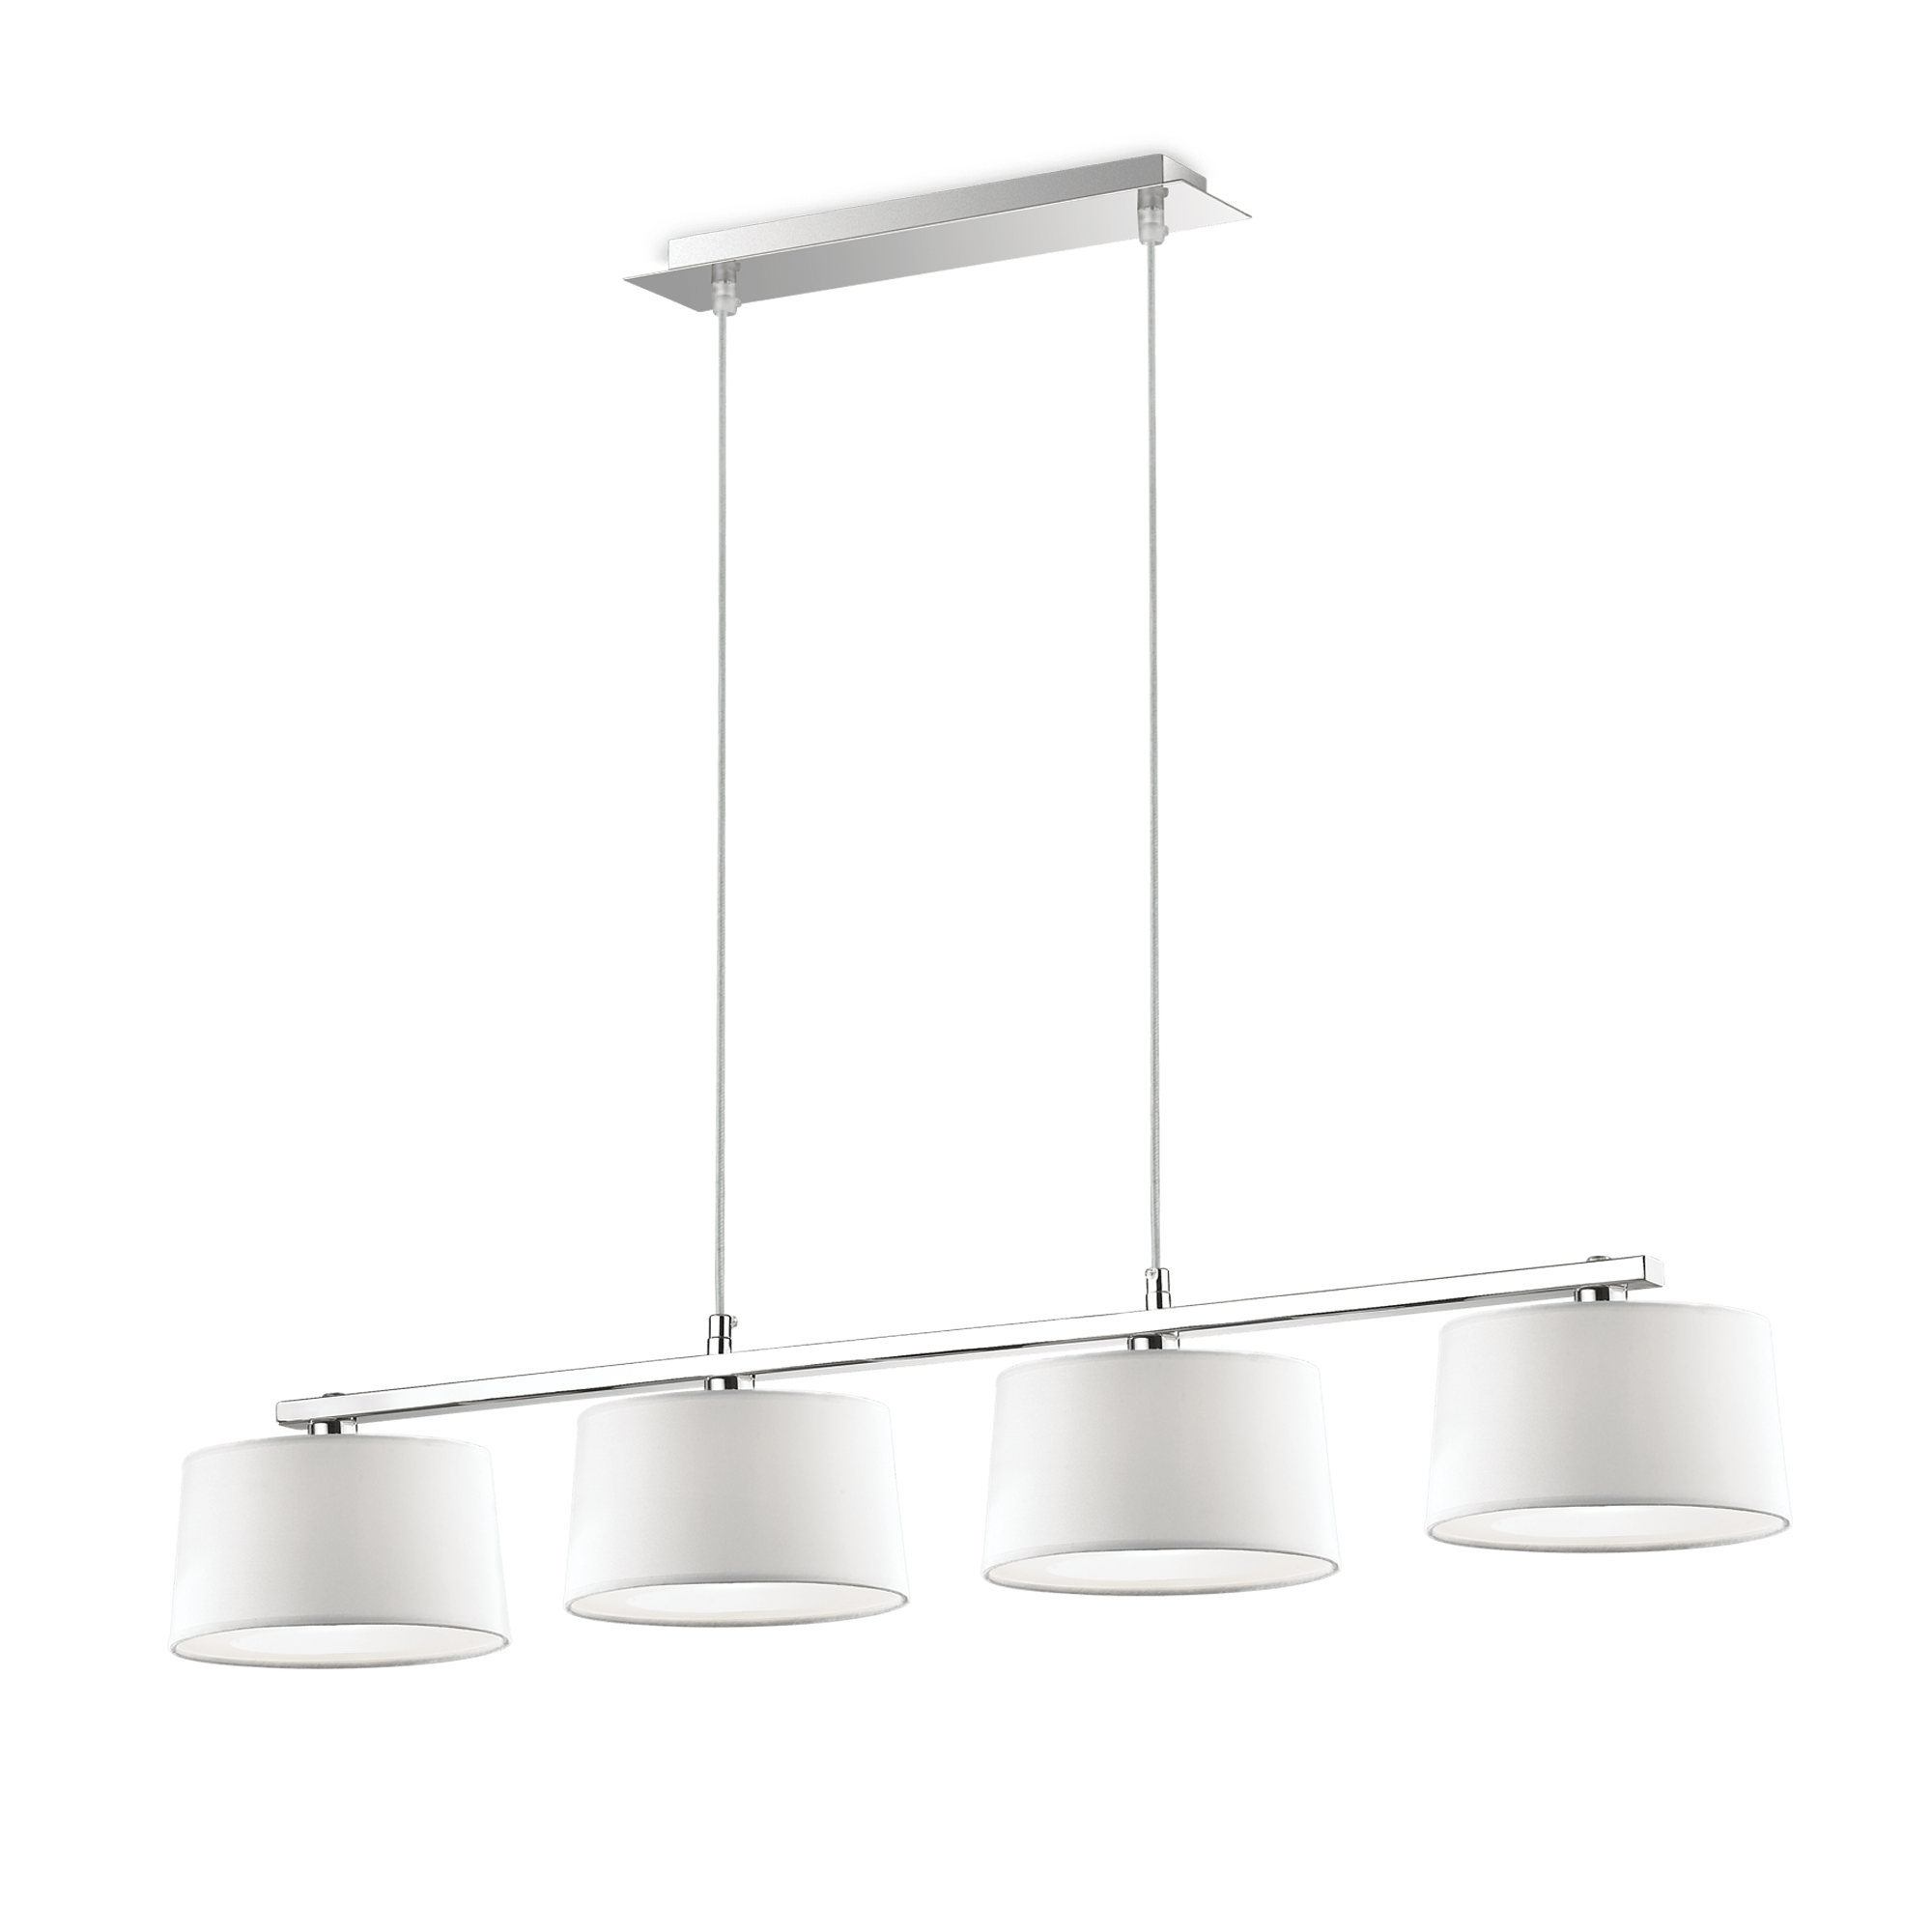 Ideal Lux 075495 Hilton SP4 Linear Bianco lámpa függeszték